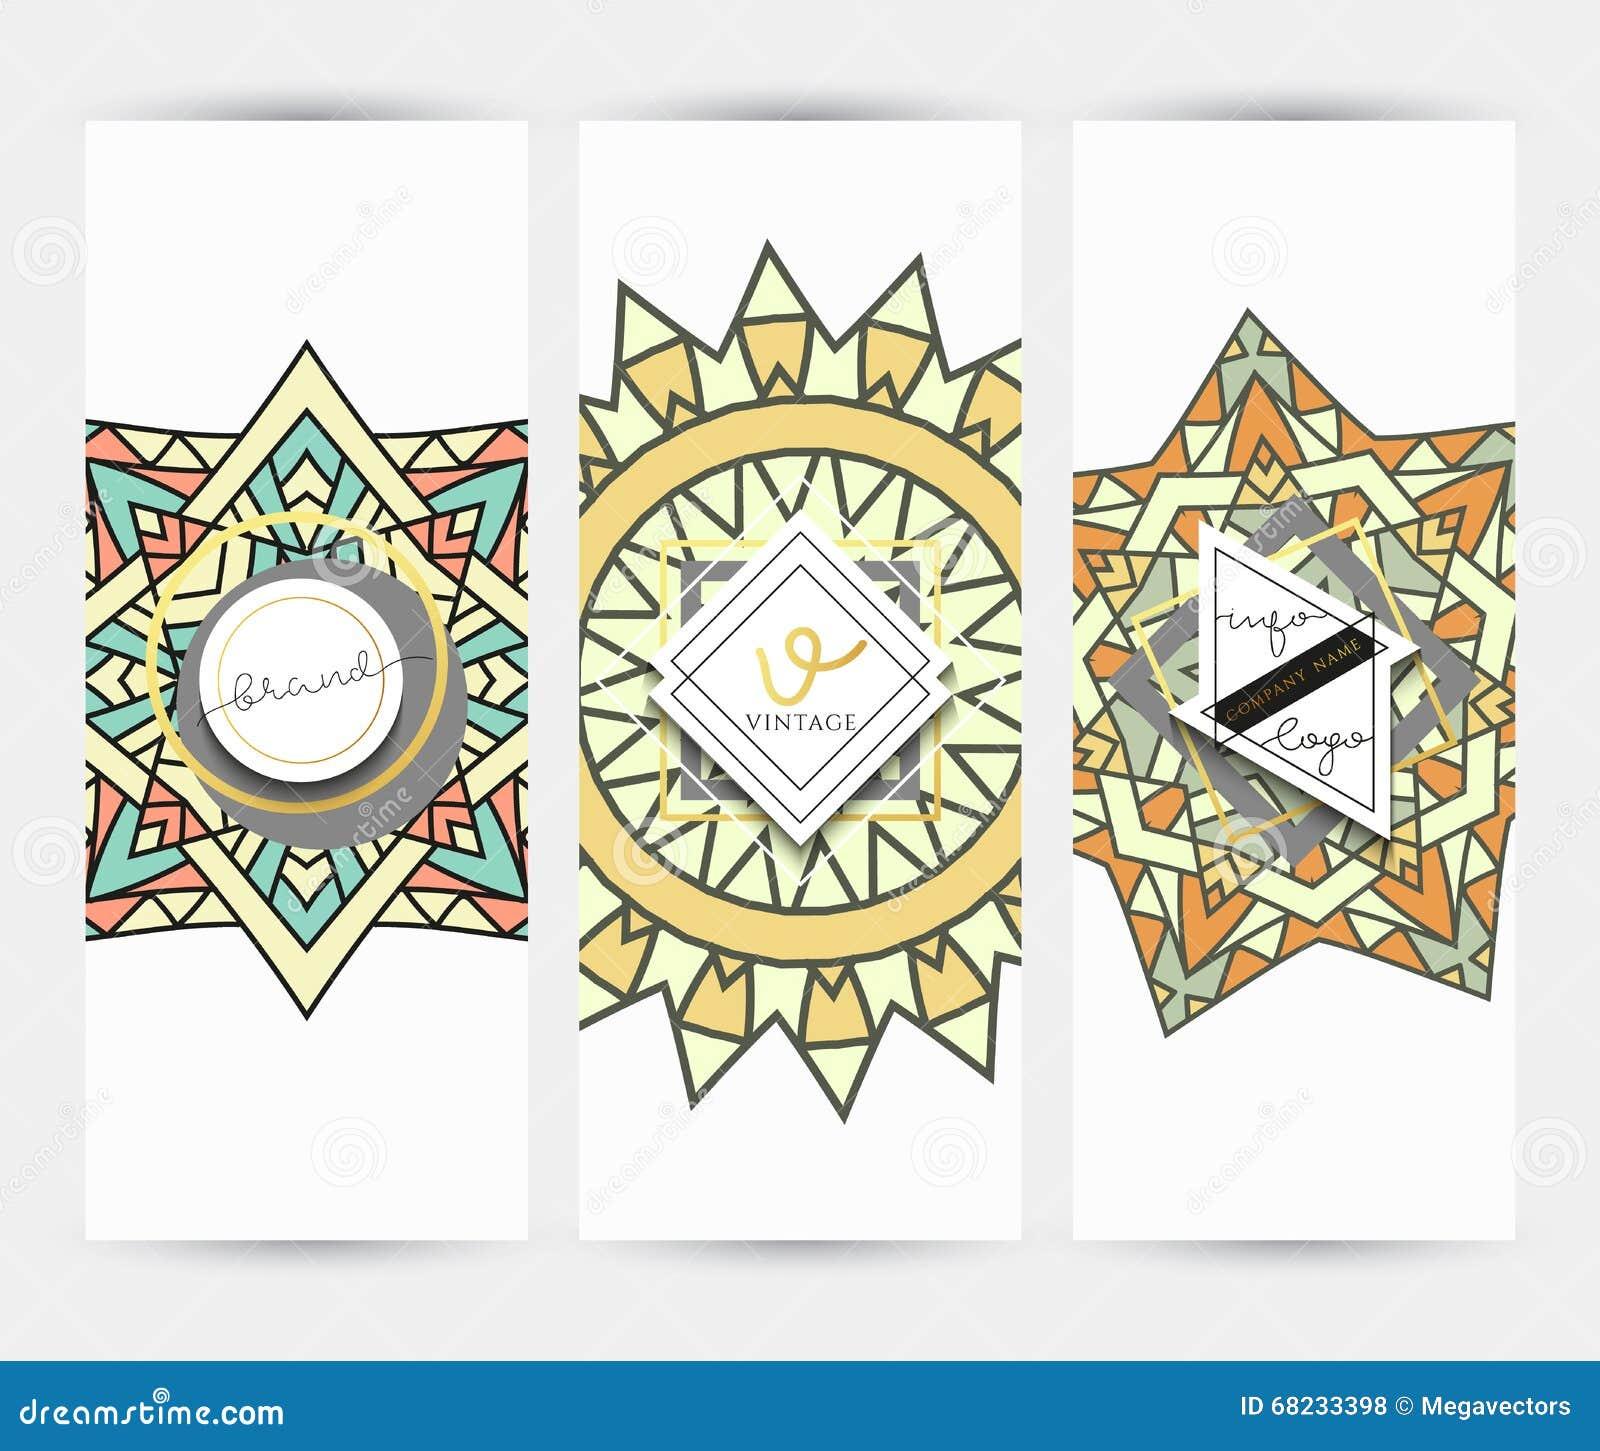 Mandala business card with ornament handmade in retro colors business card with ornament handmade in retro colors stock vector illustration reheart Choice Image